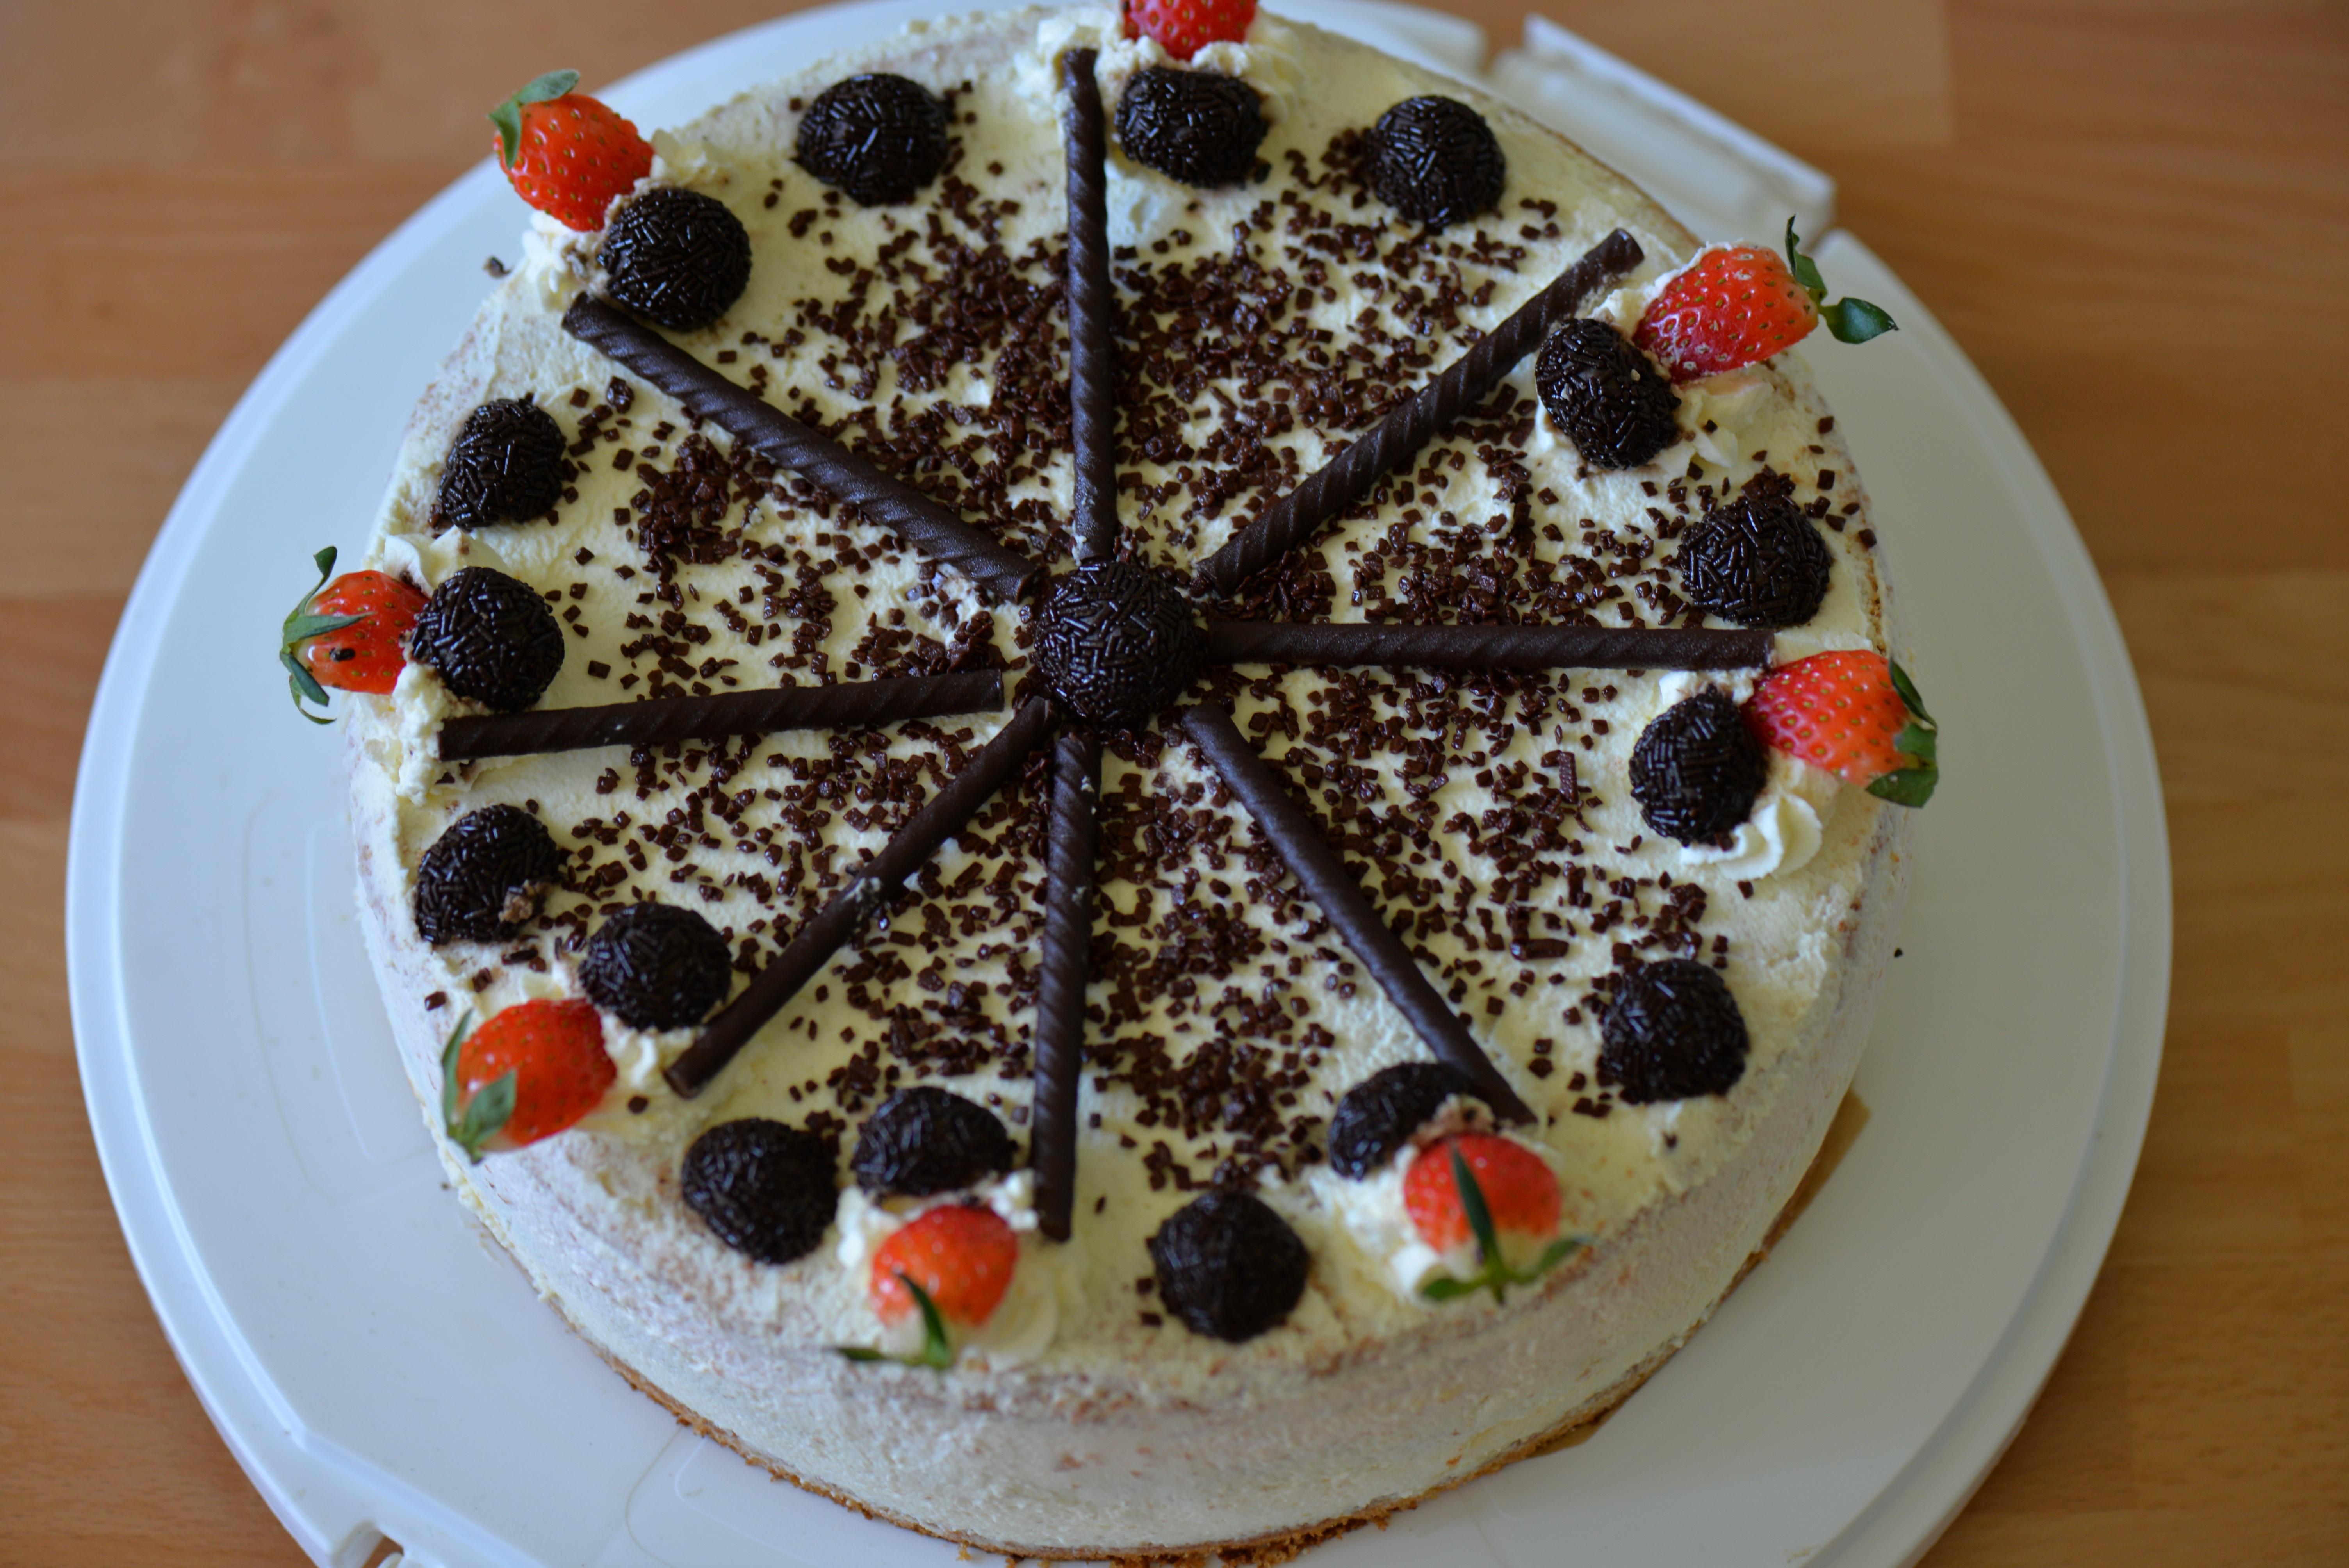 dulce decoracin plato comida chocolate postre crema pastel ornamento pastel de cumpleaos crema batida imagen genial